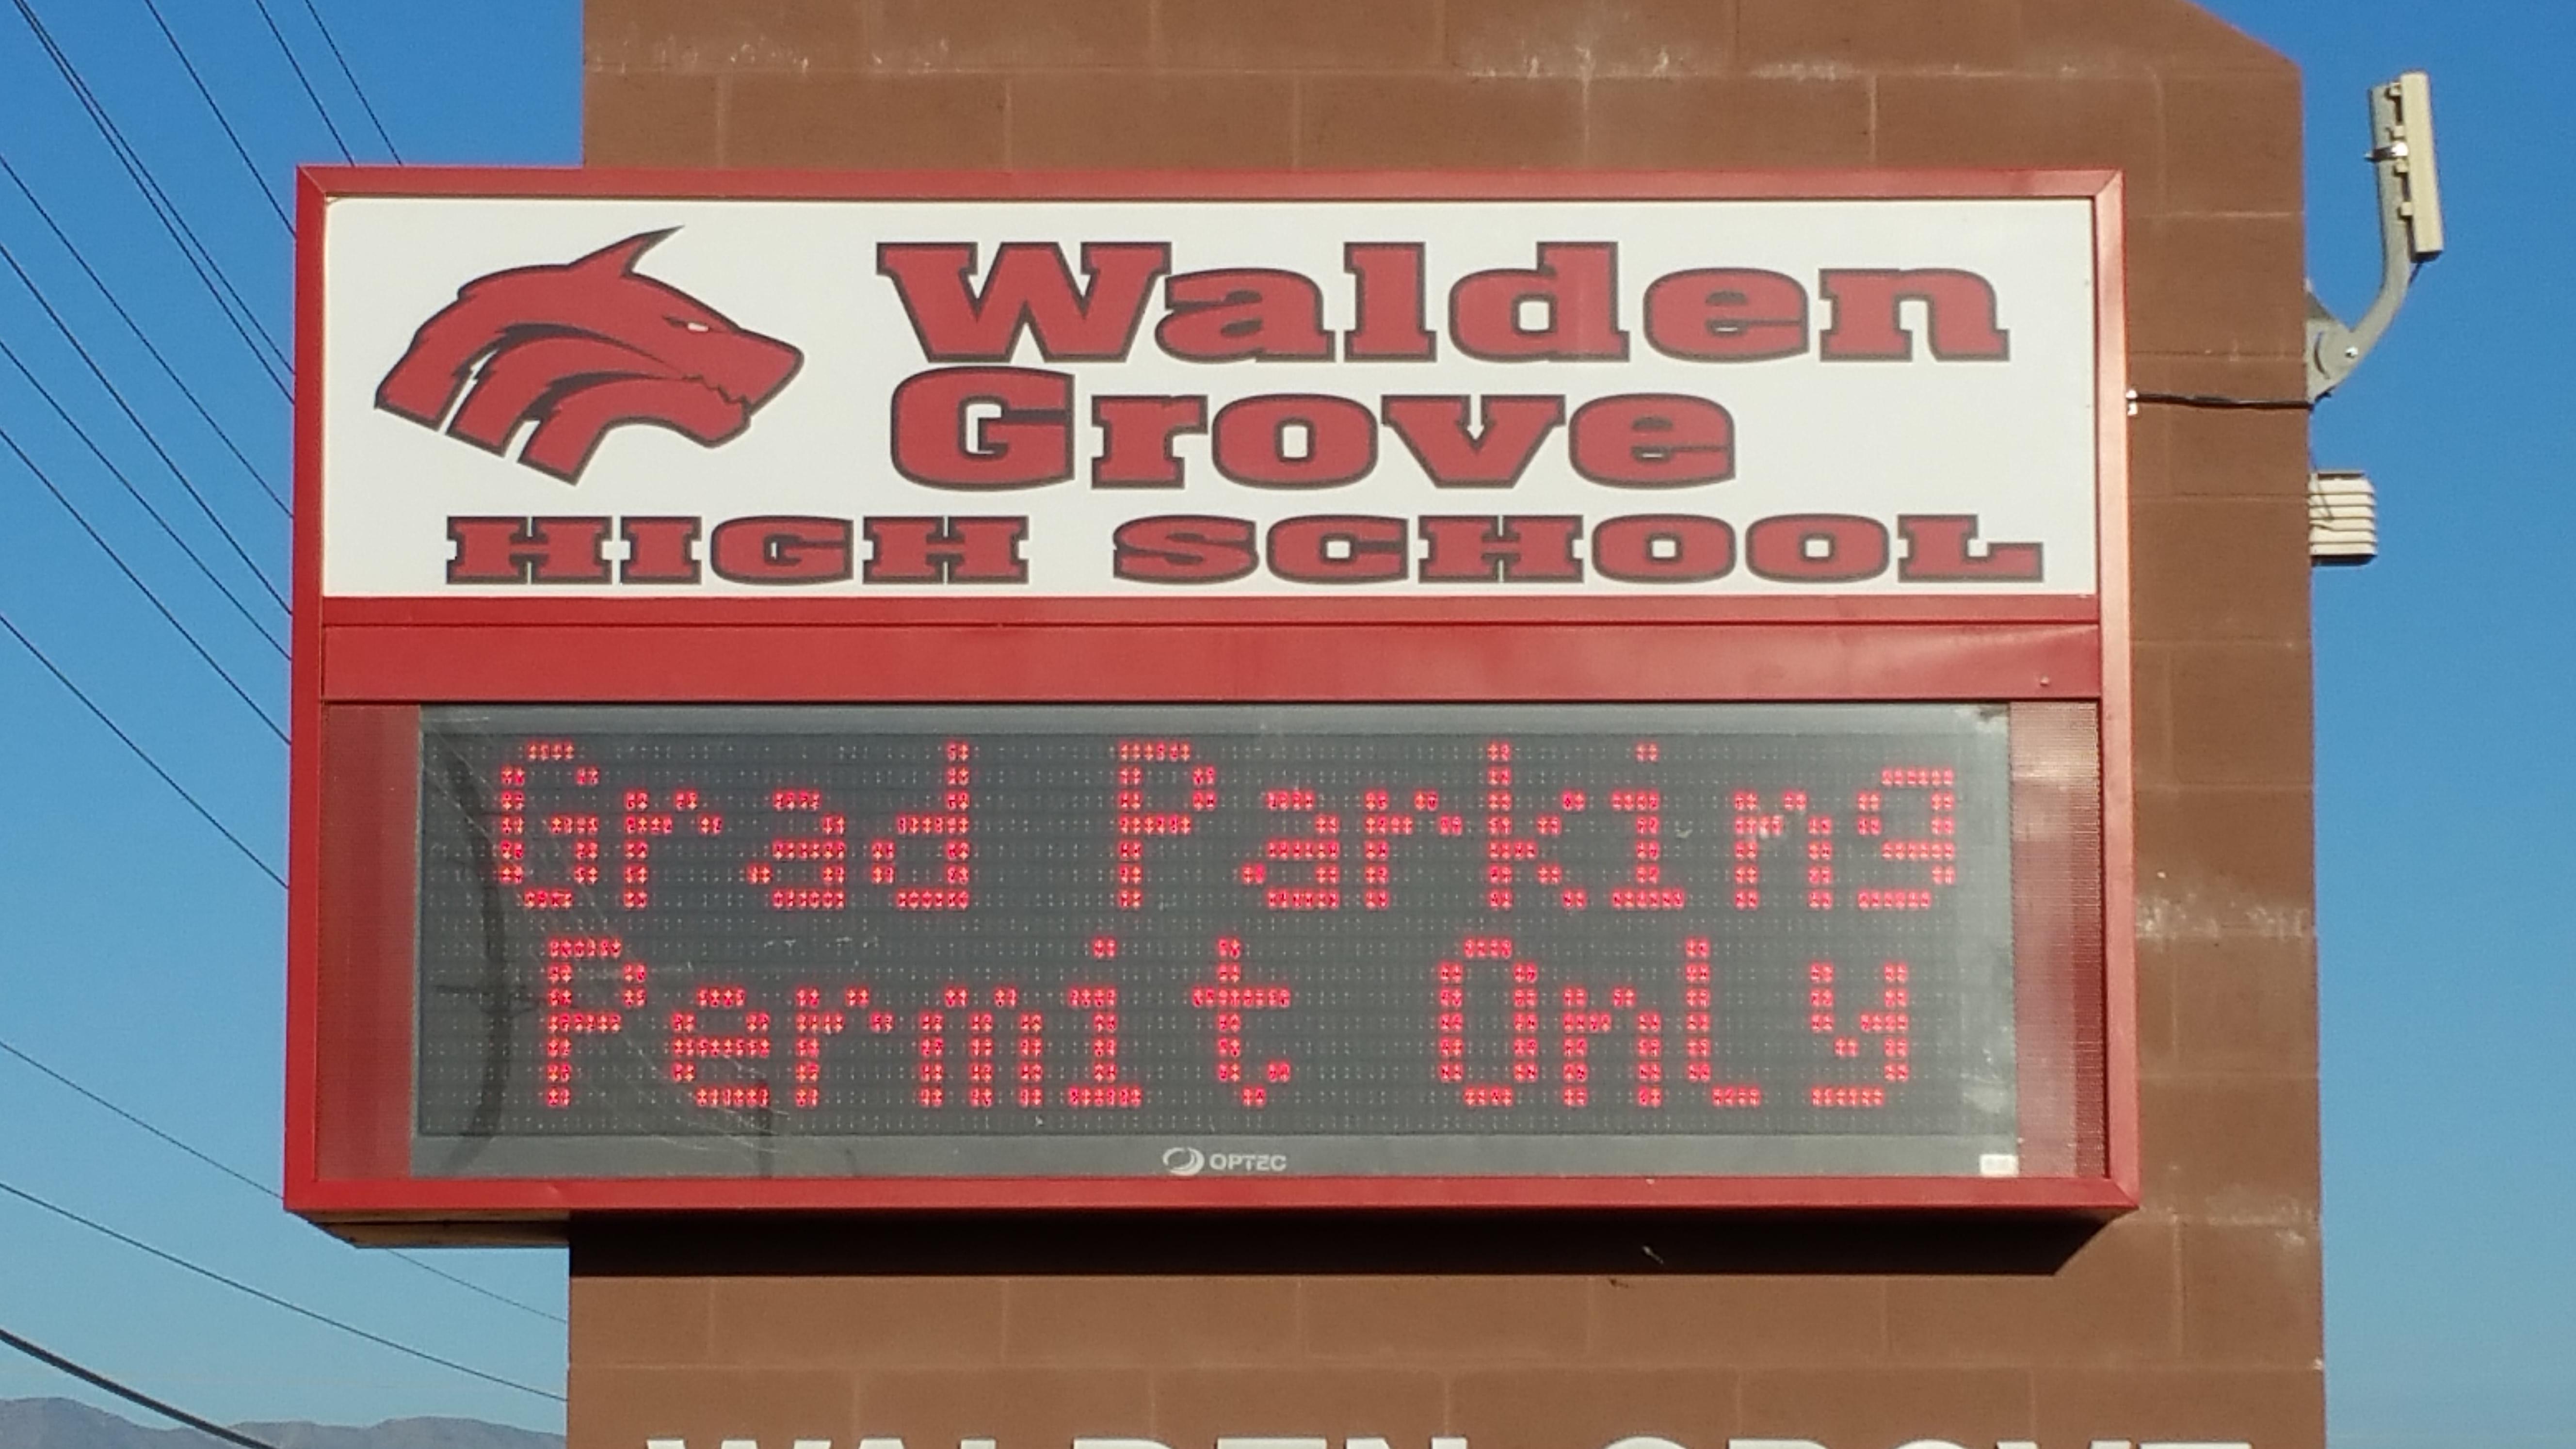 Event: Walden Grove High School